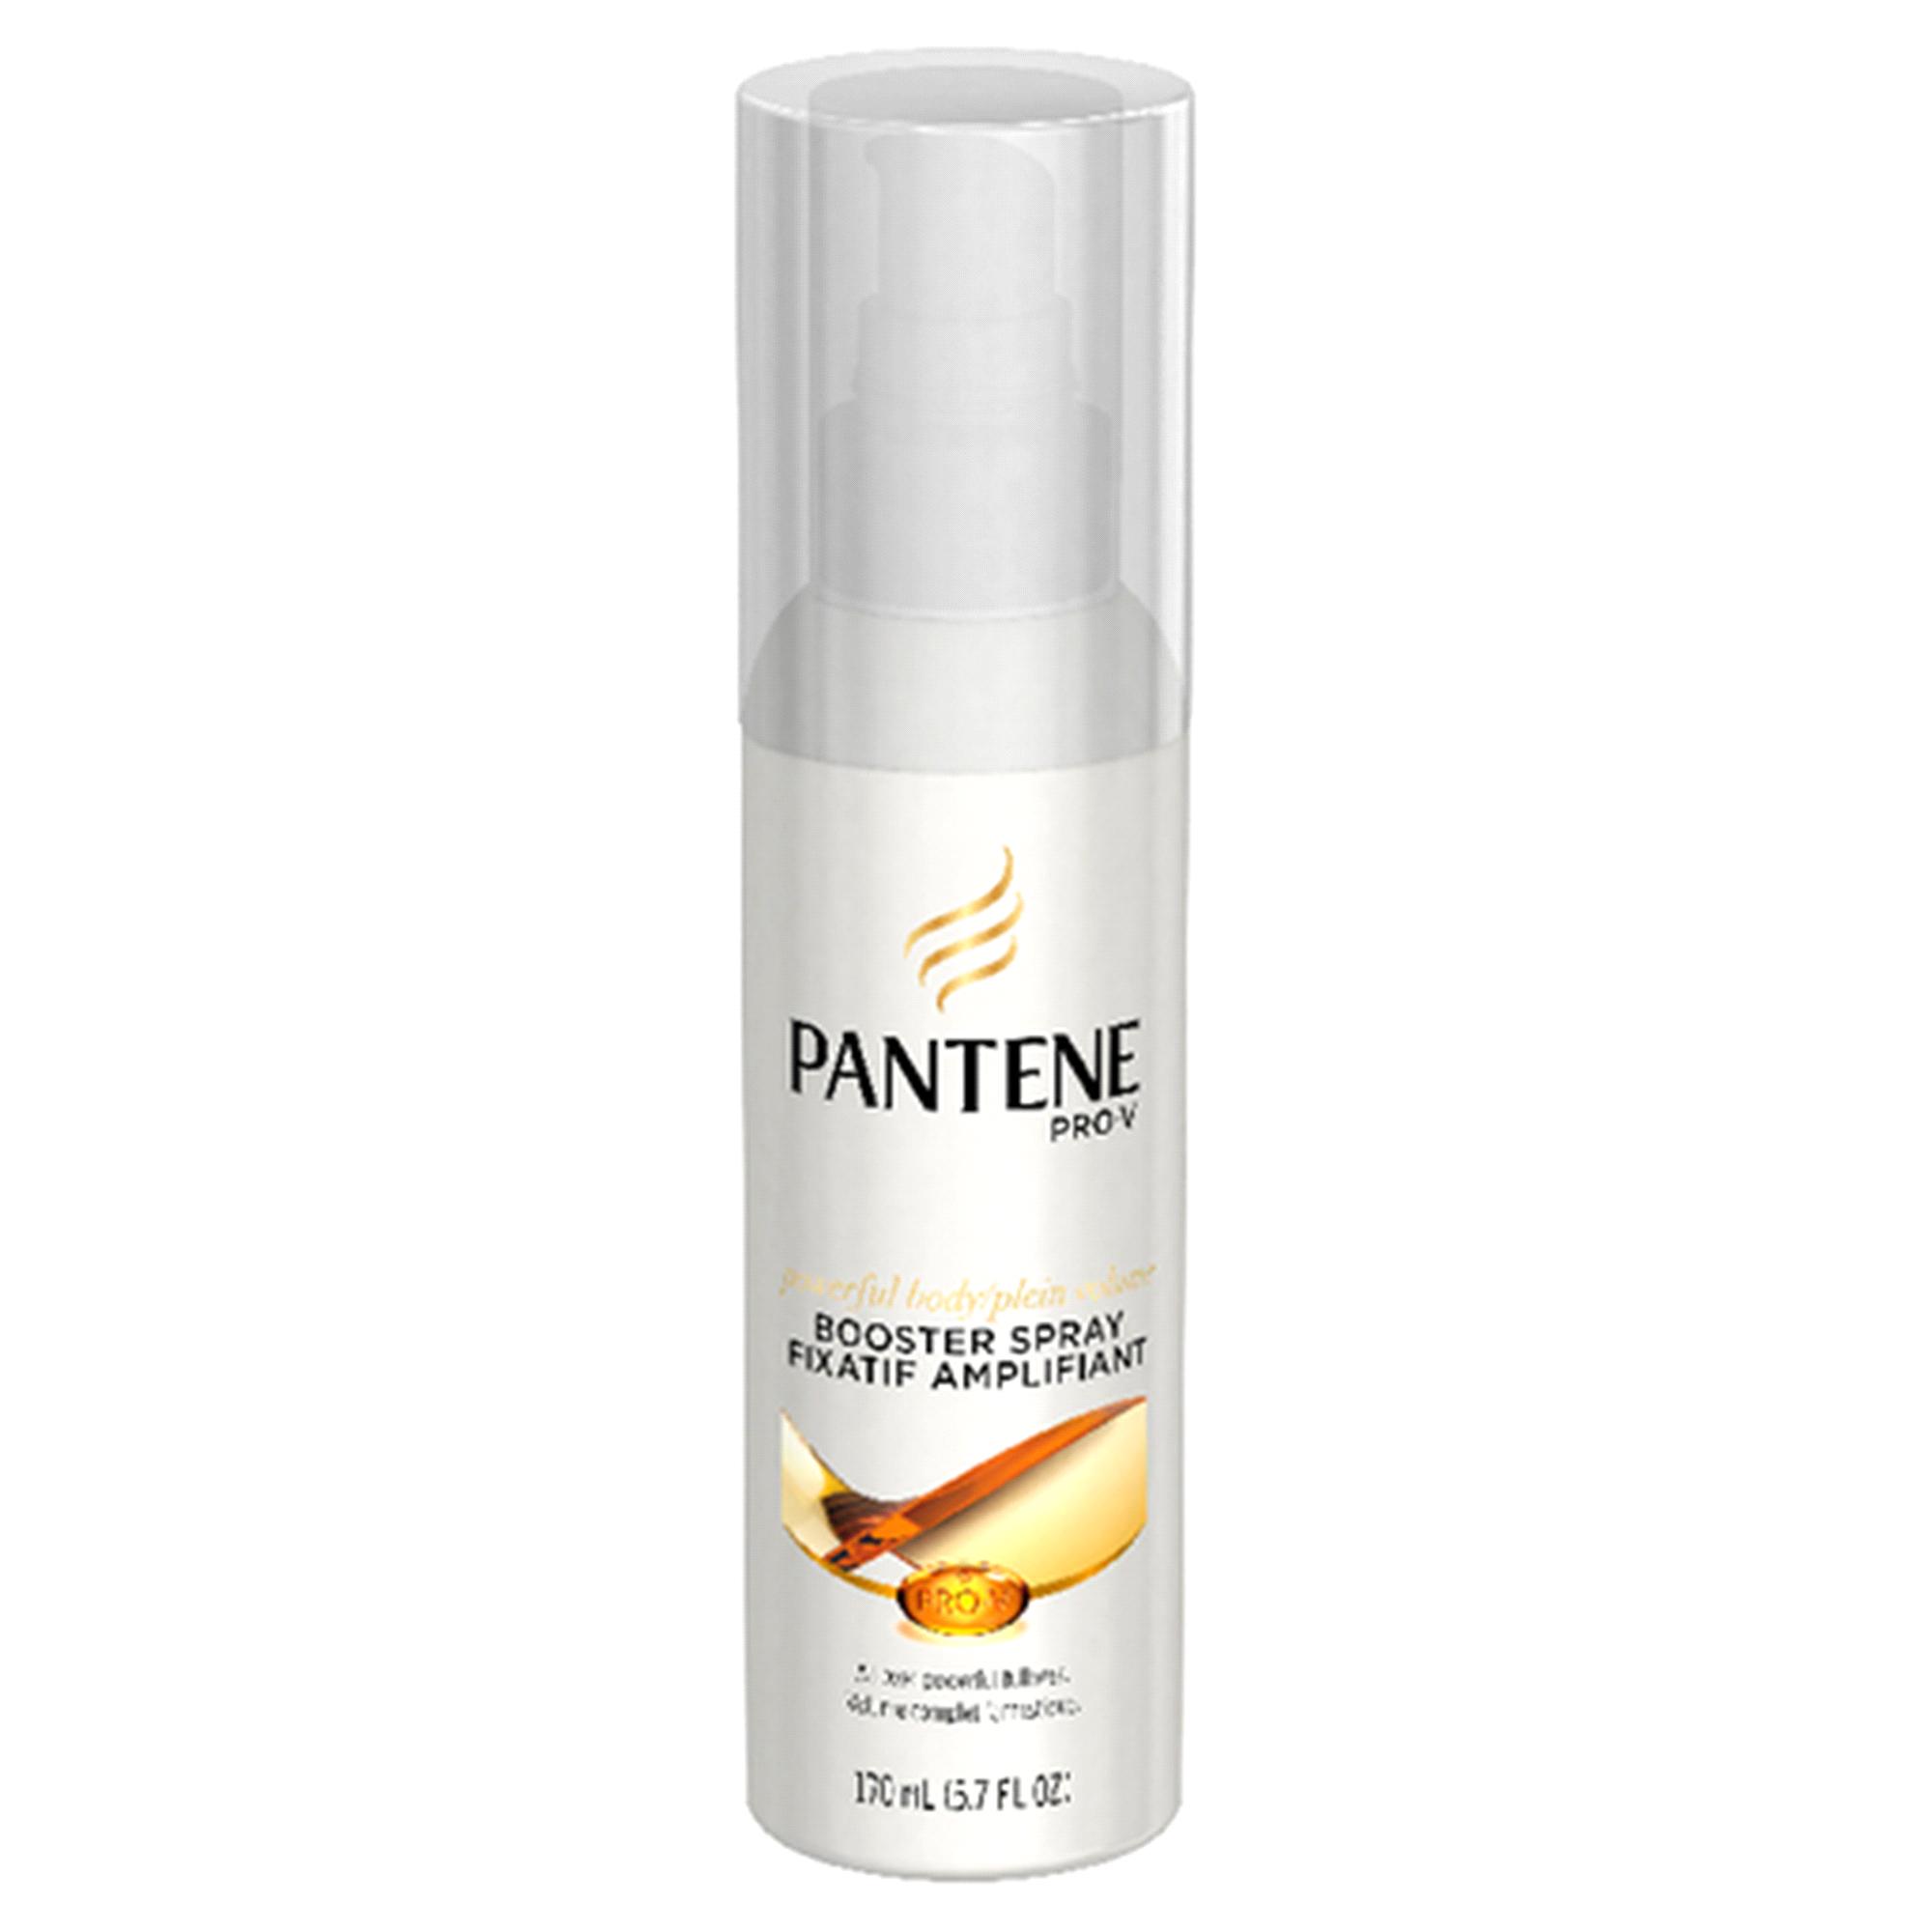 Pantene Pro V Powerfull Body Booster Spray 57 Oz Shampoo Nature Care Fullness Life 170 Ml